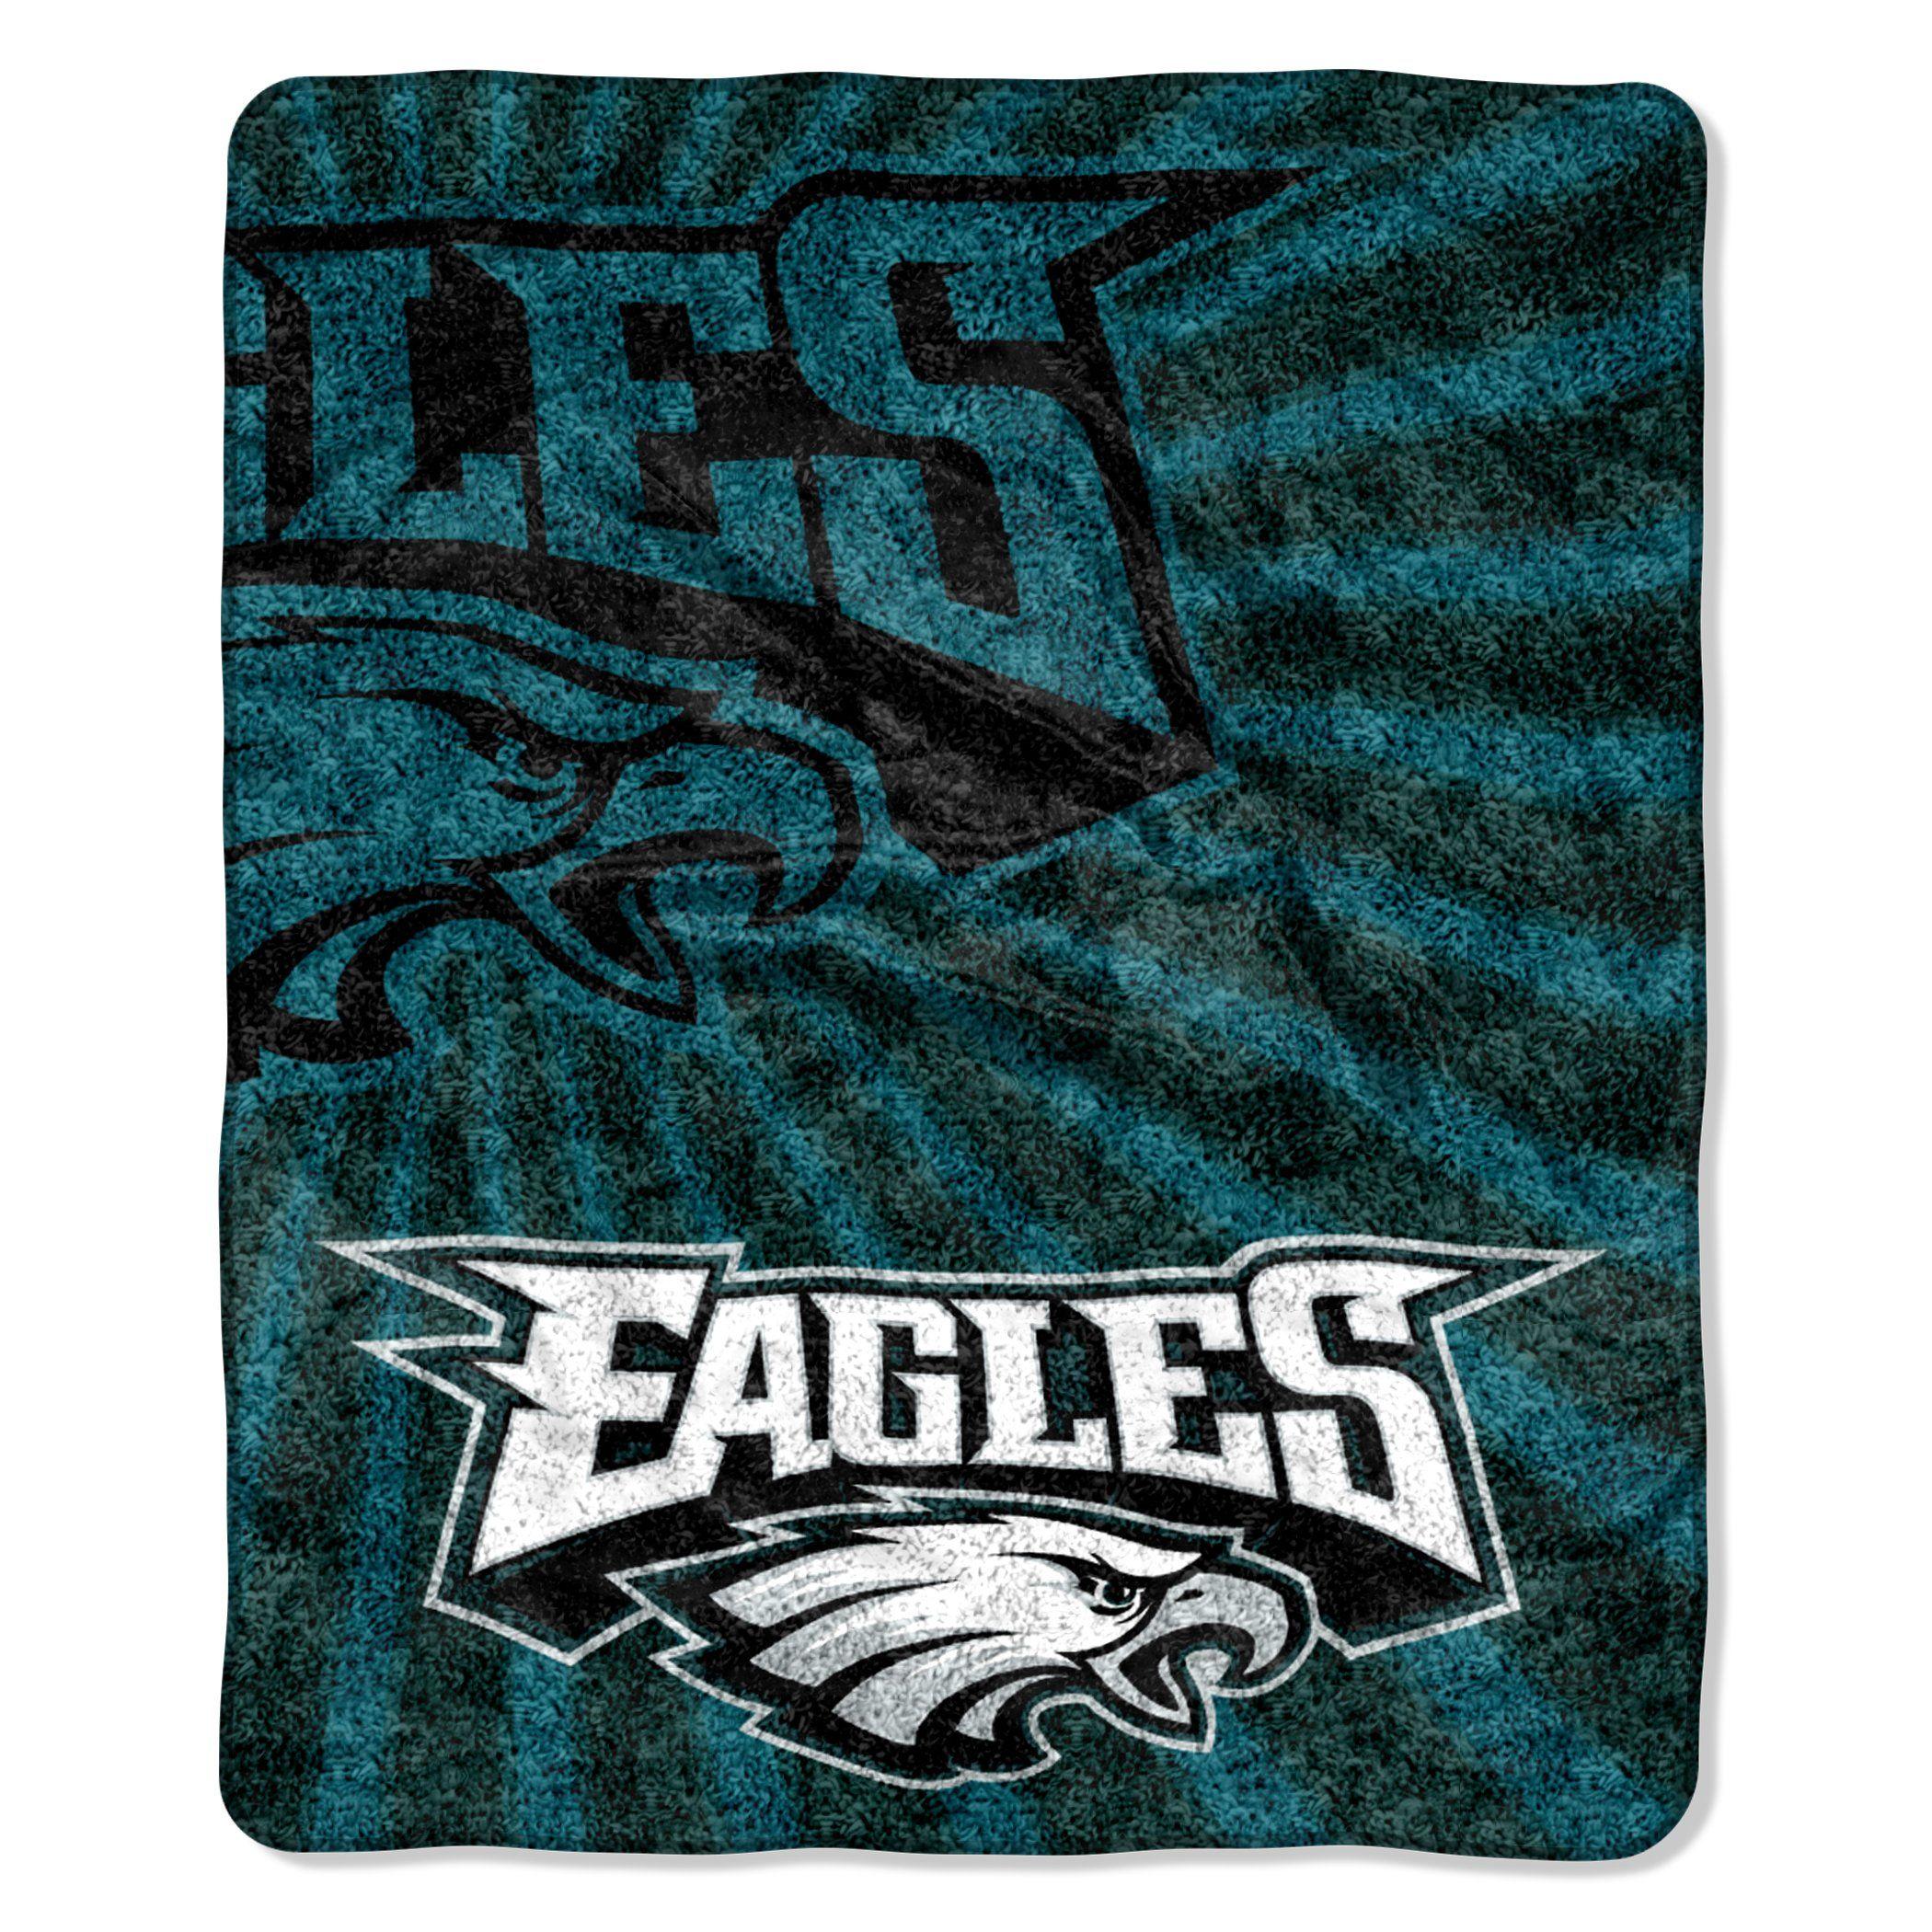 a3370a3262c Philadelphia Eagles Blanket 50x60 Sherpa Strobe Design  PhiladelphiaEagles